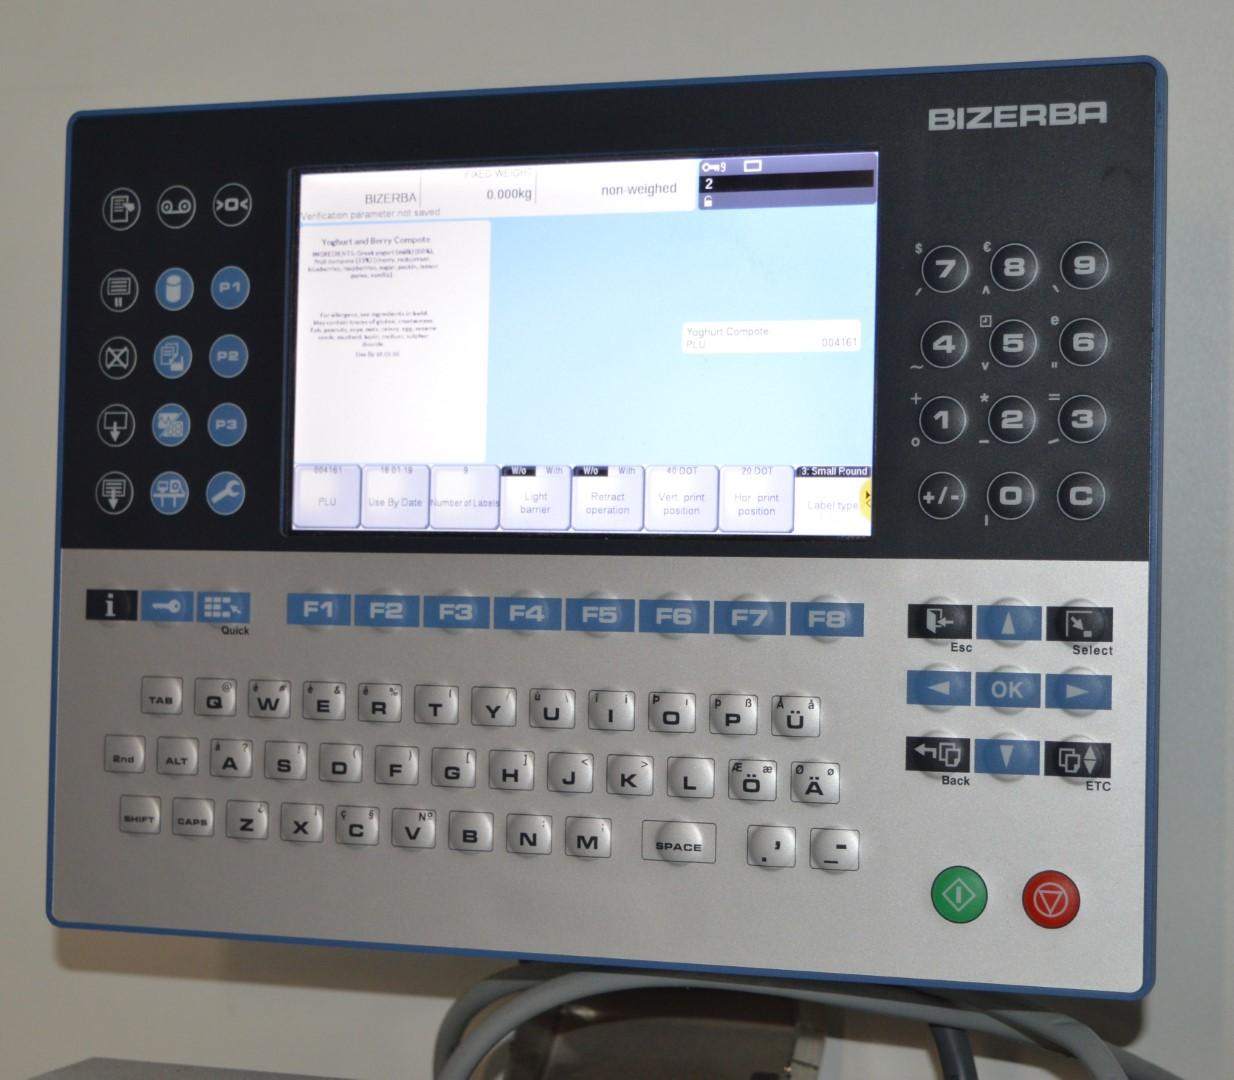 Lot 28 - 1 x Bizerba GLP Maxx Industrial Barcode Thermal Label Printer - Intel Atom Processor and 2gb Ram -